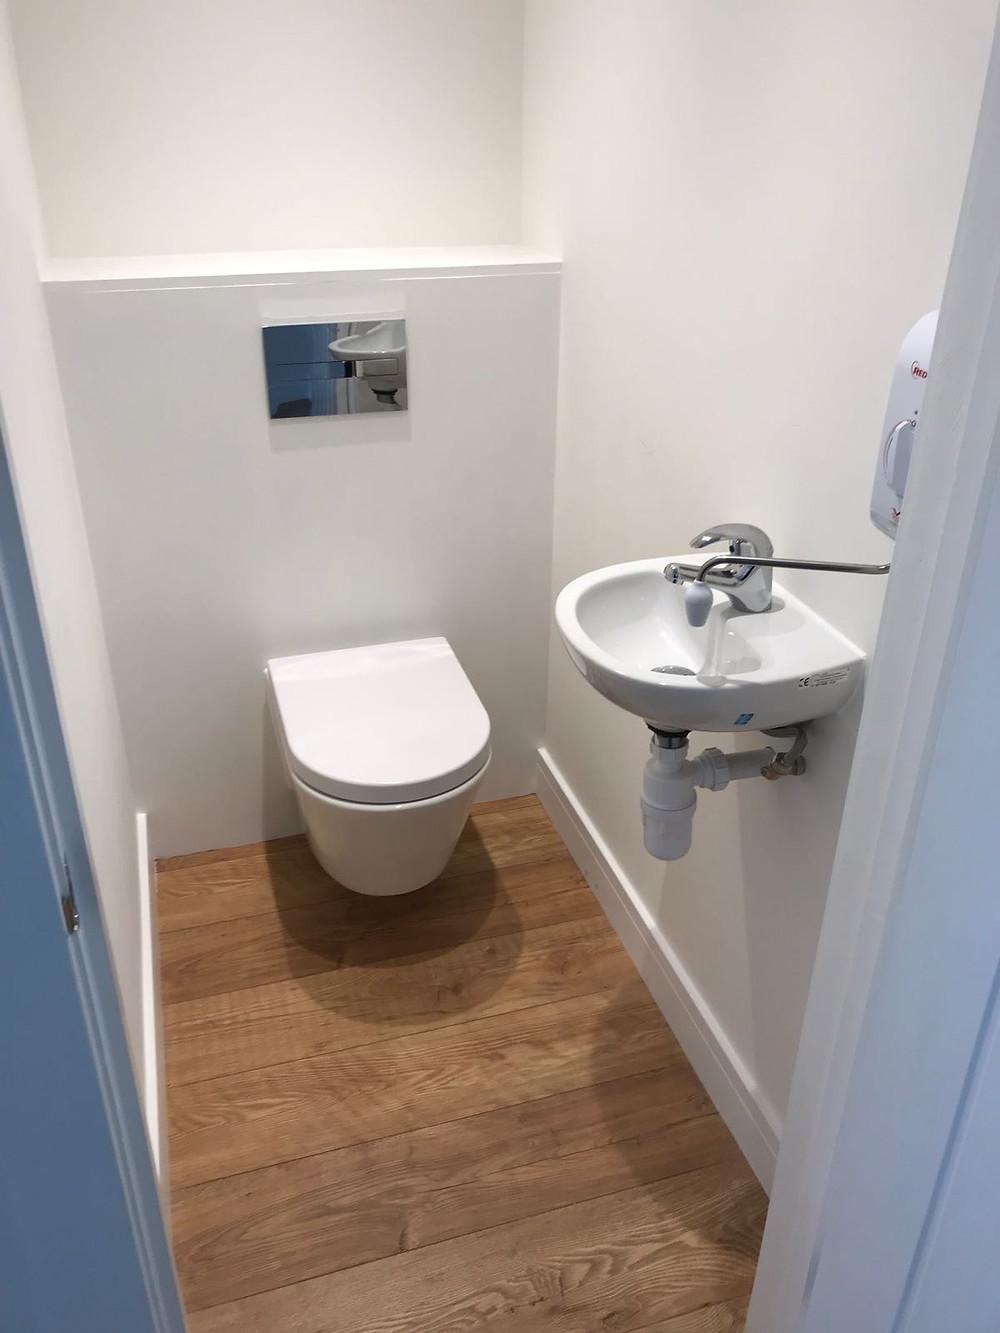 Garden Room with Separate Bathroom